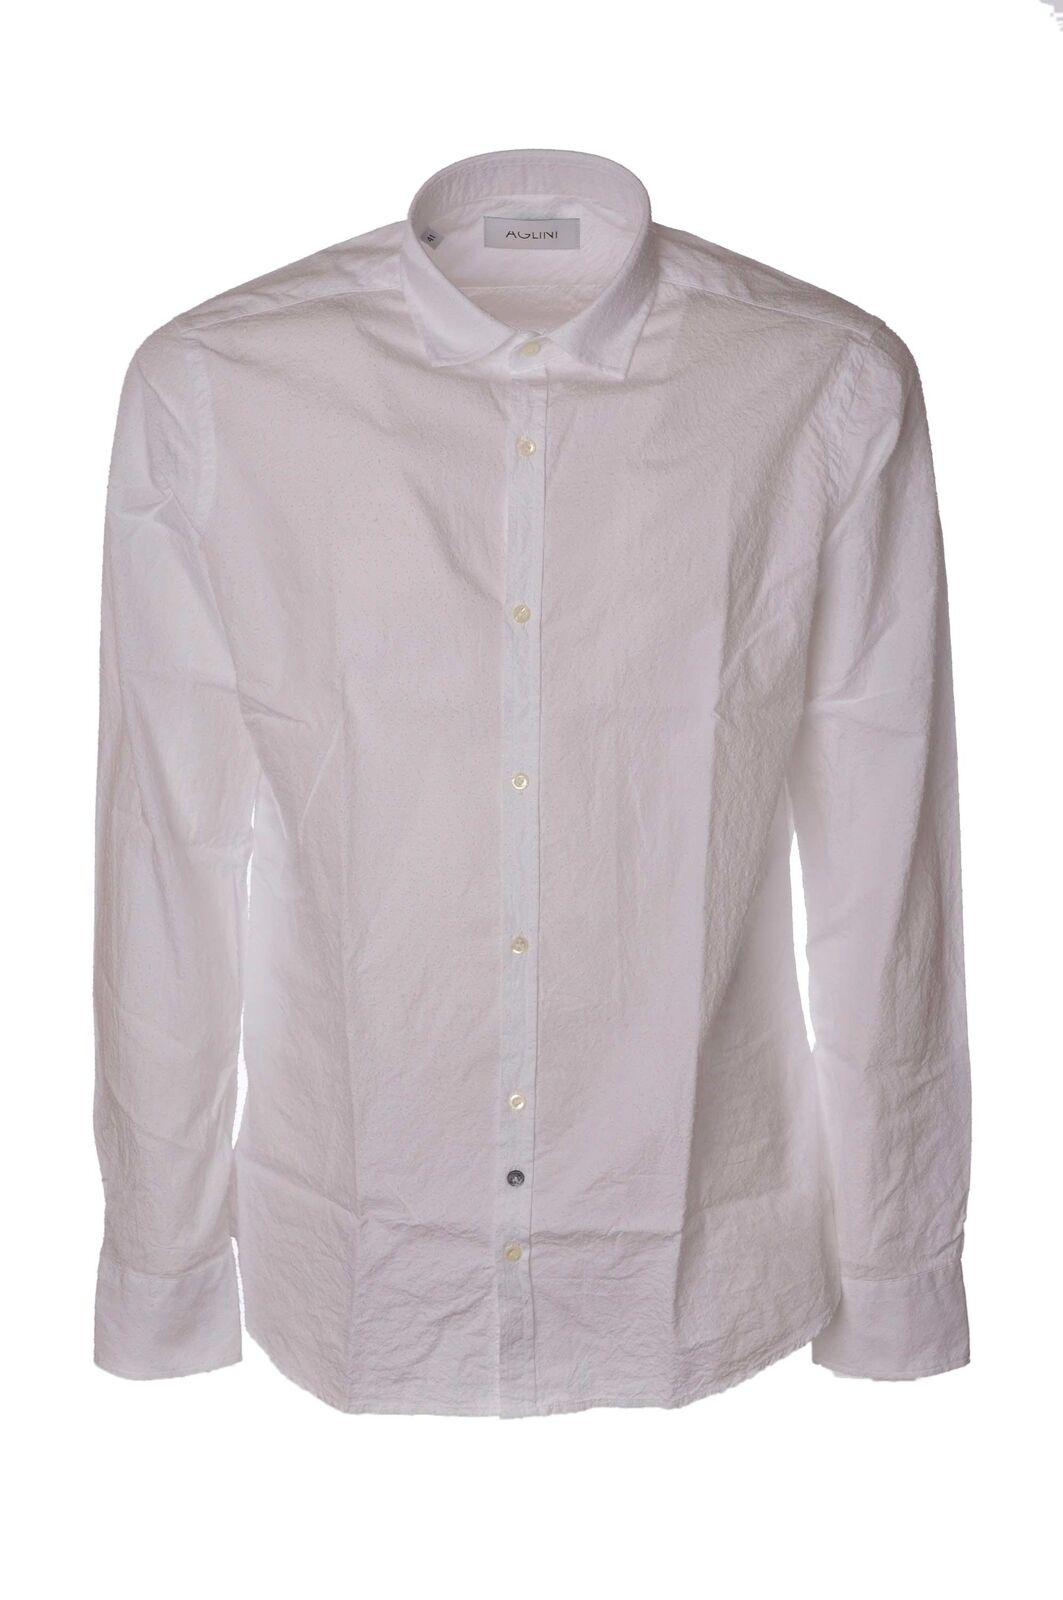 Aglini - Shirts-Shirt - Man - White - 4064230F184016